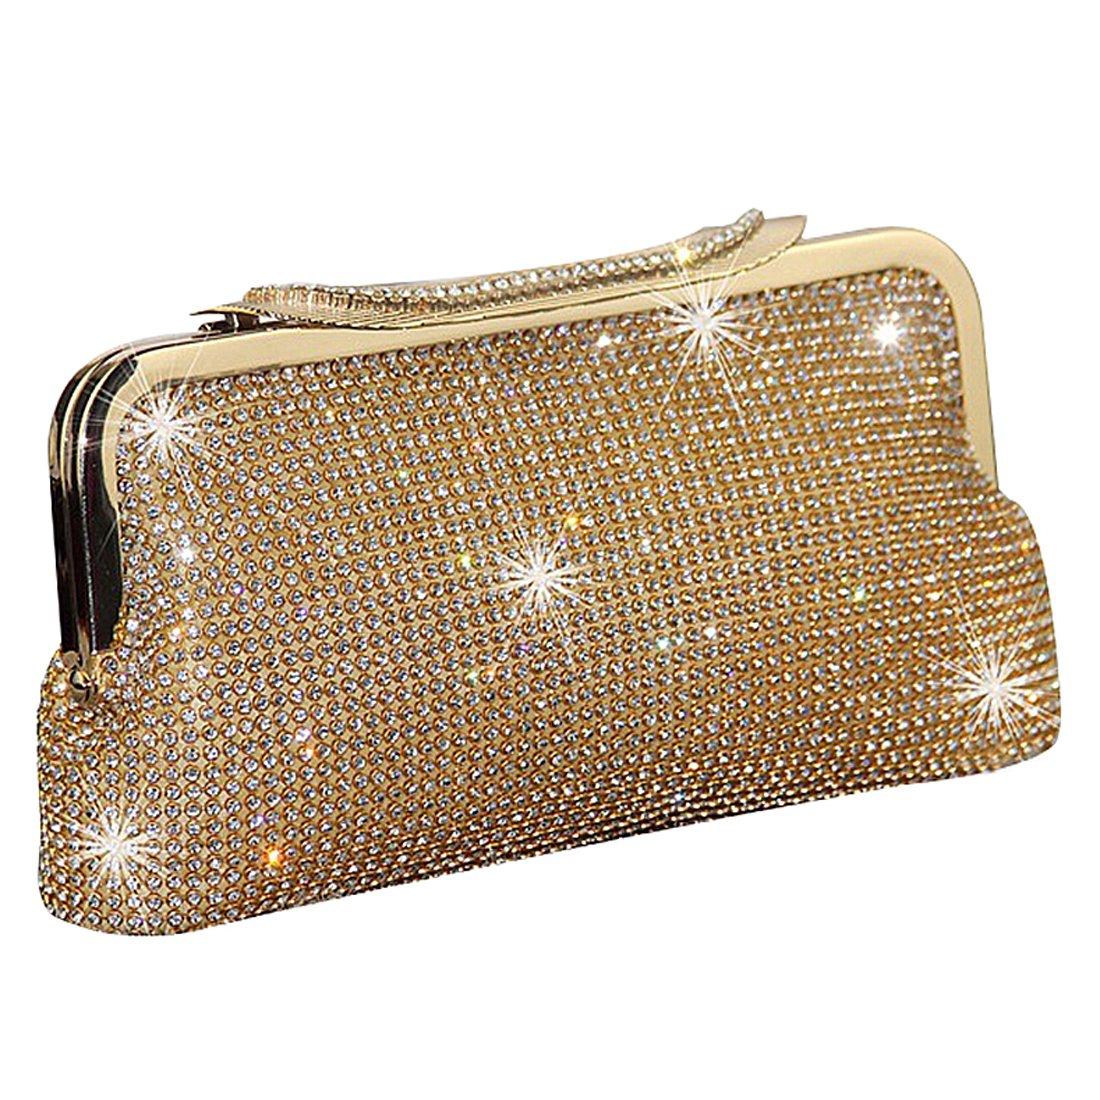 1eef5e9ff2 SSMK Fashion Womens Glitter Clutch Bag Bling Evening Bridal Prom Party  Handbag Purse (Gold)  Amazon.co.uk  Shoes   Bags